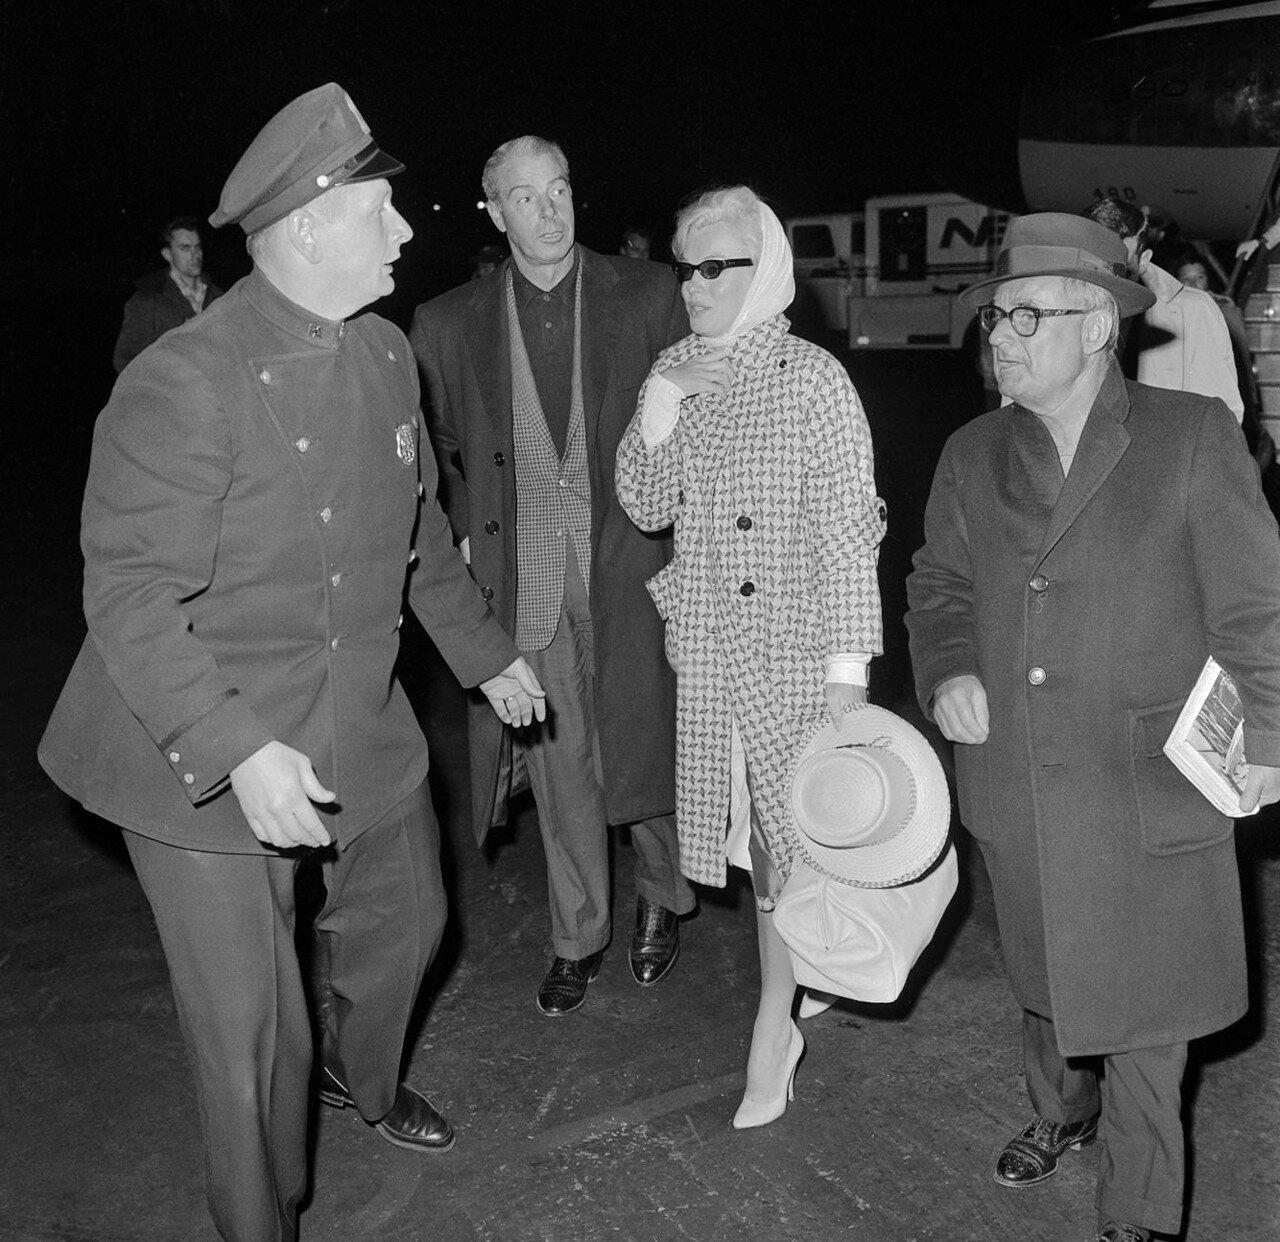 Marilyn Monroe and Joe DiMaggio Walking at Airport